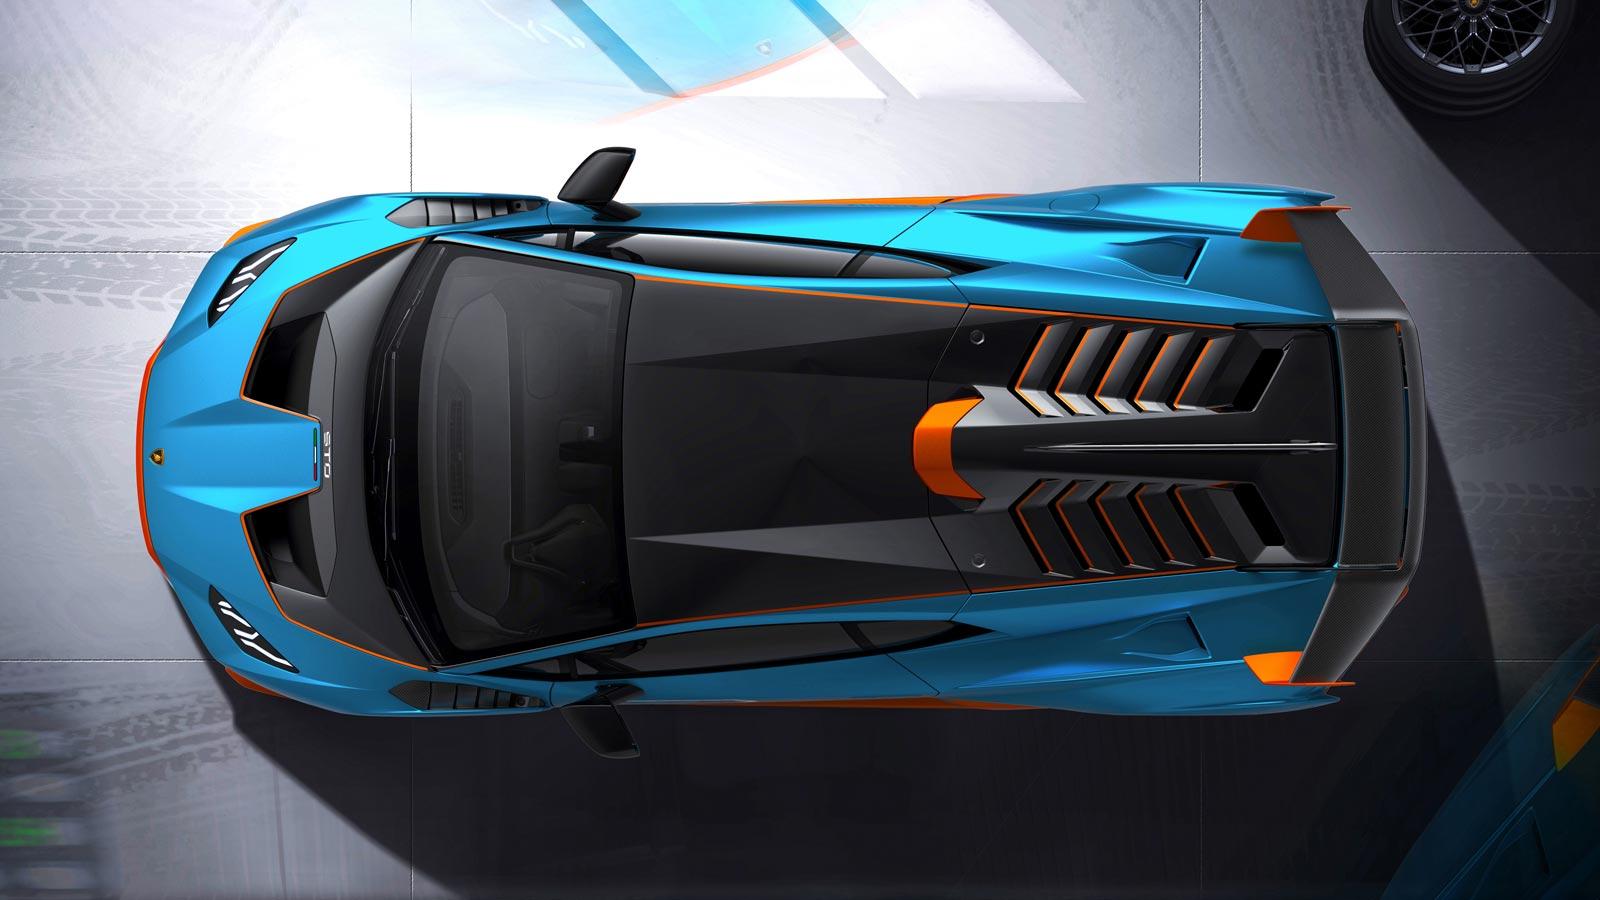 Lamborghini Huracan STO - From racetrack to road image 3